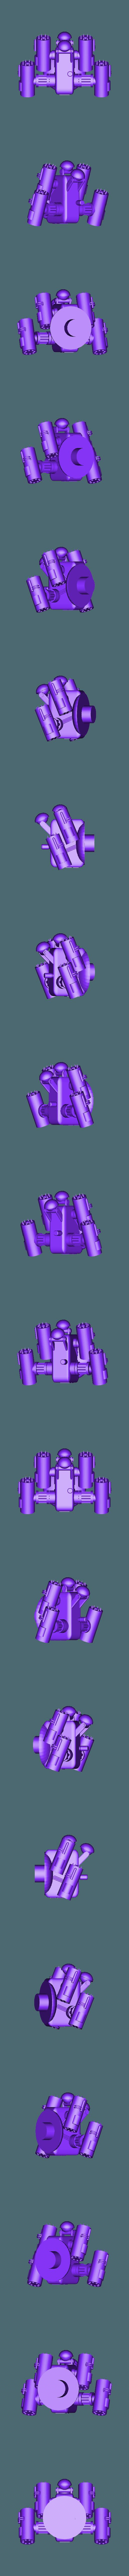 Rocket__turret_with_peg.stl Download free STL file Anti-aircraft tower for 28mm wargames, Warhammer, Star wars, Gas lands ect • 3D print model, redstarkits